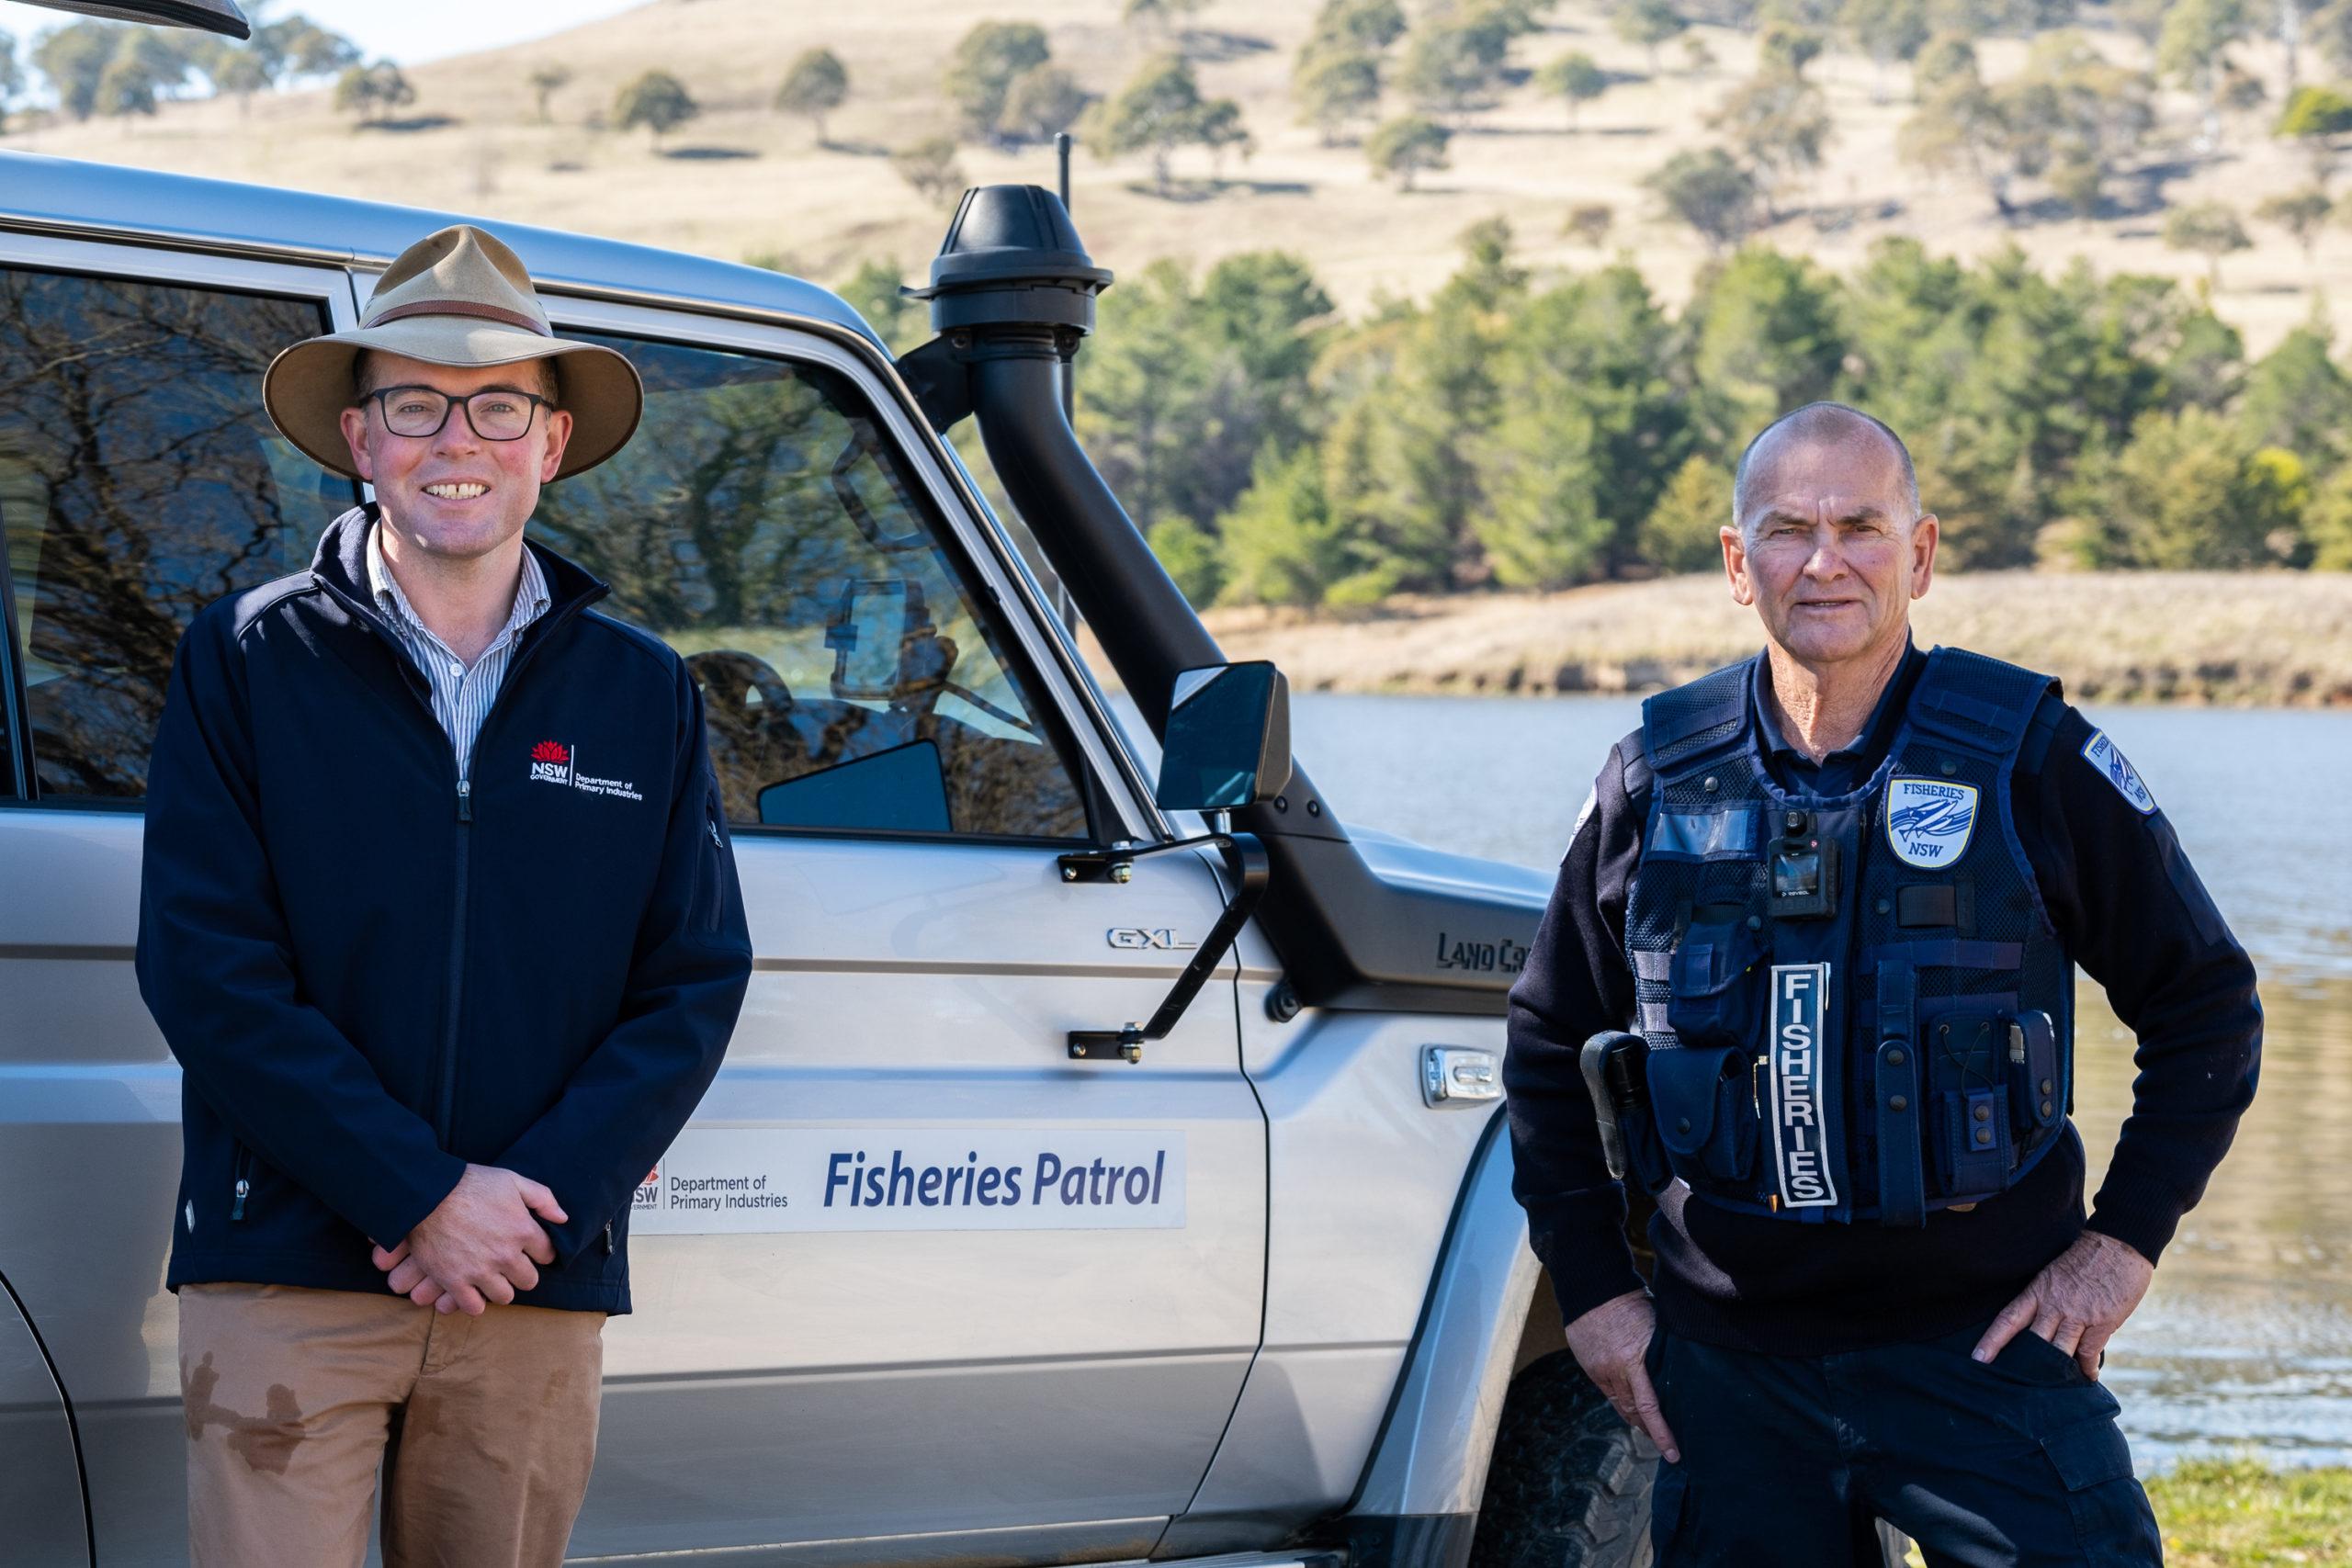 NSW authorities slap more penalties on non-compliant fishing